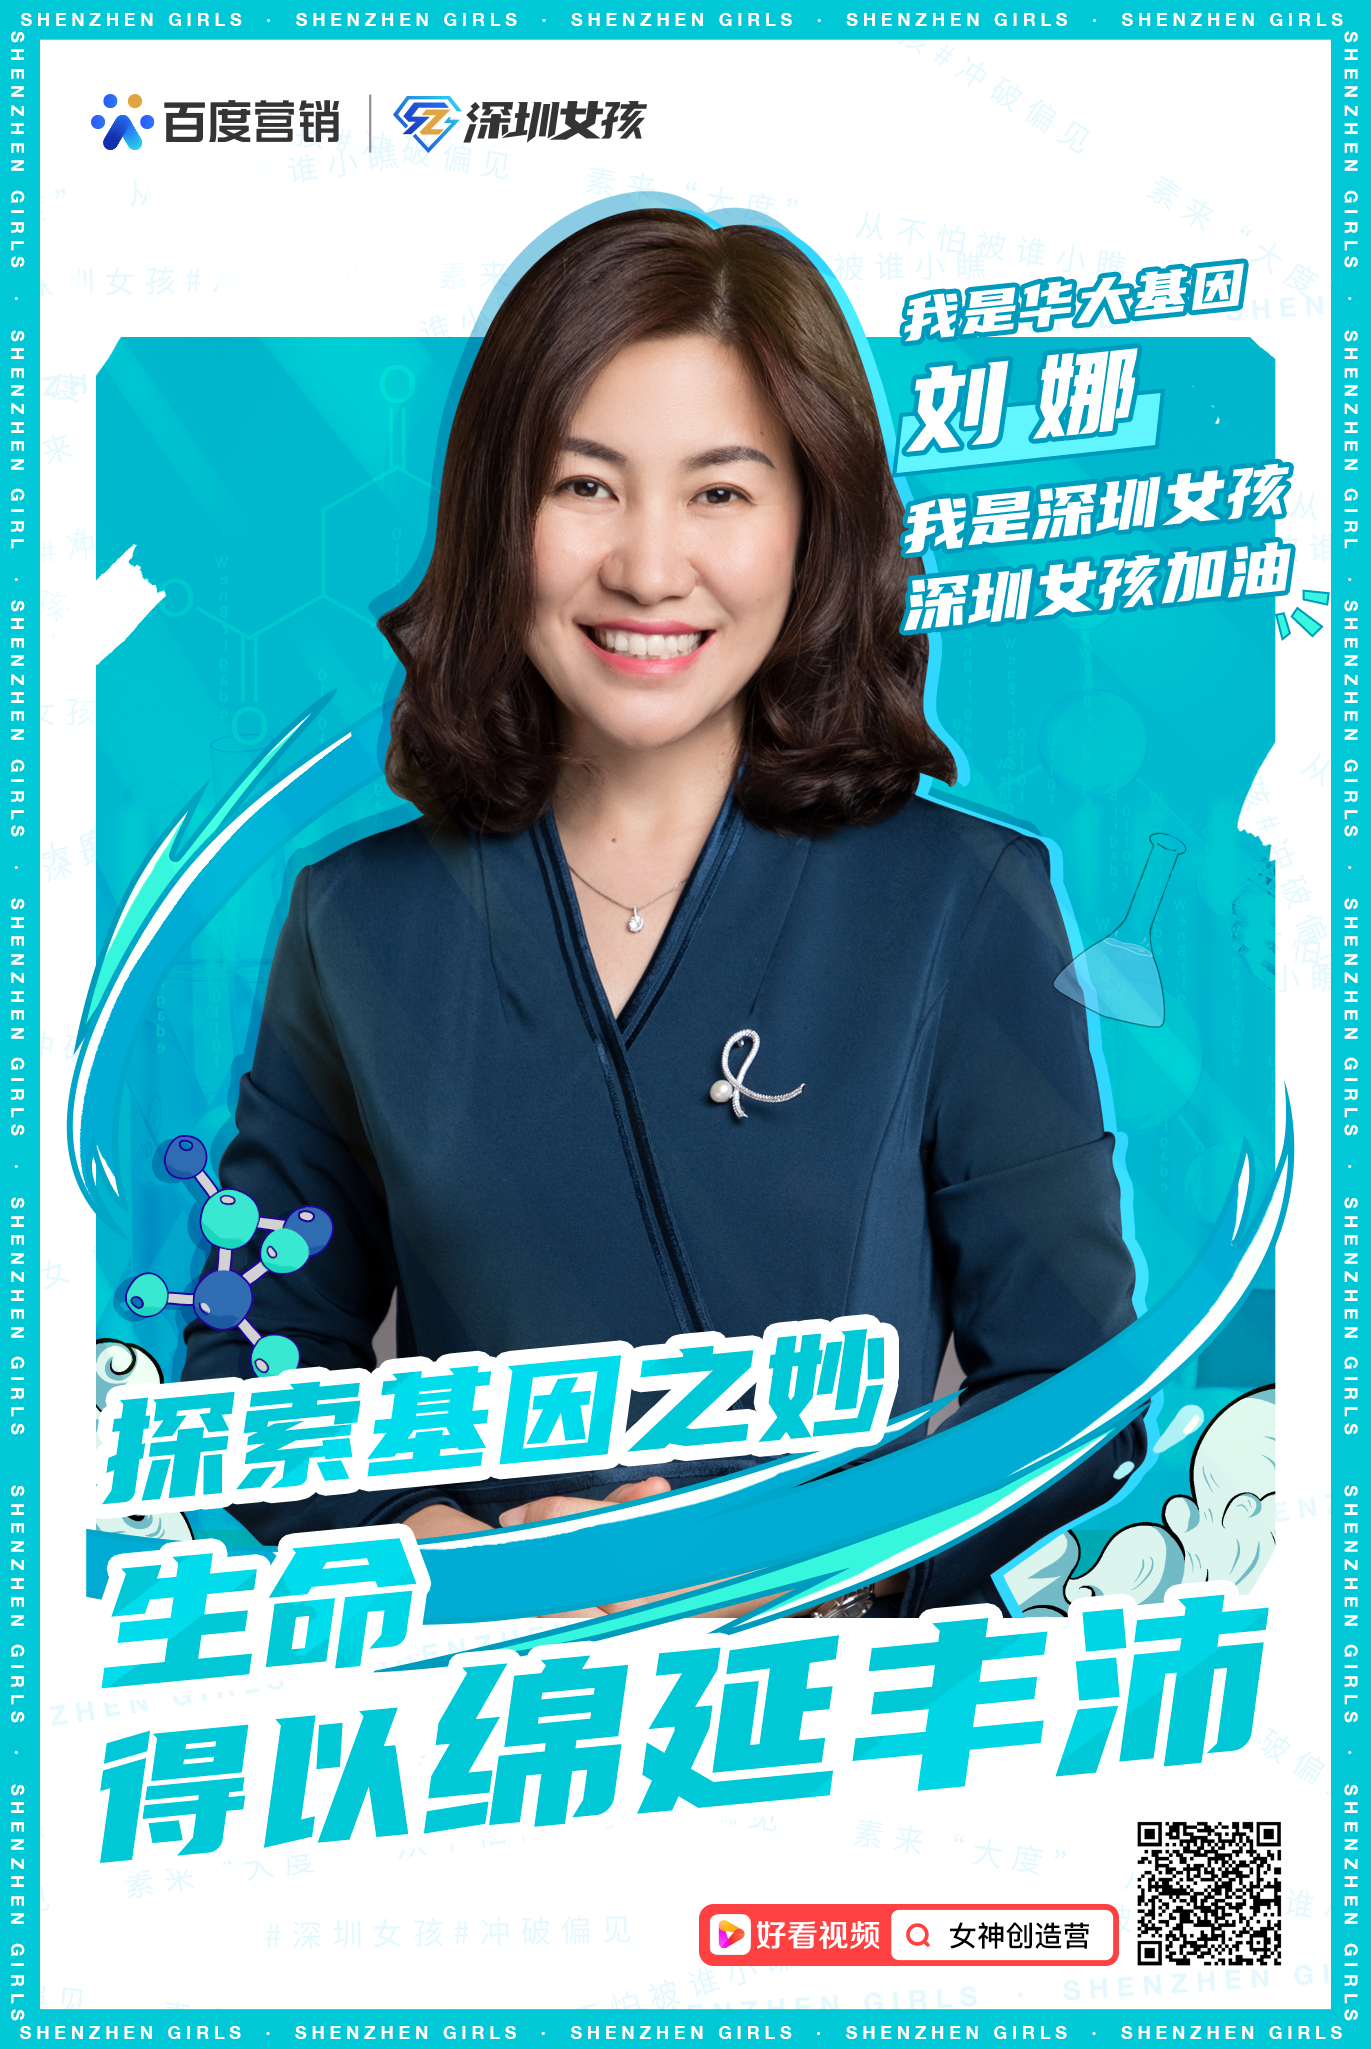 华大基因刘娜1.png